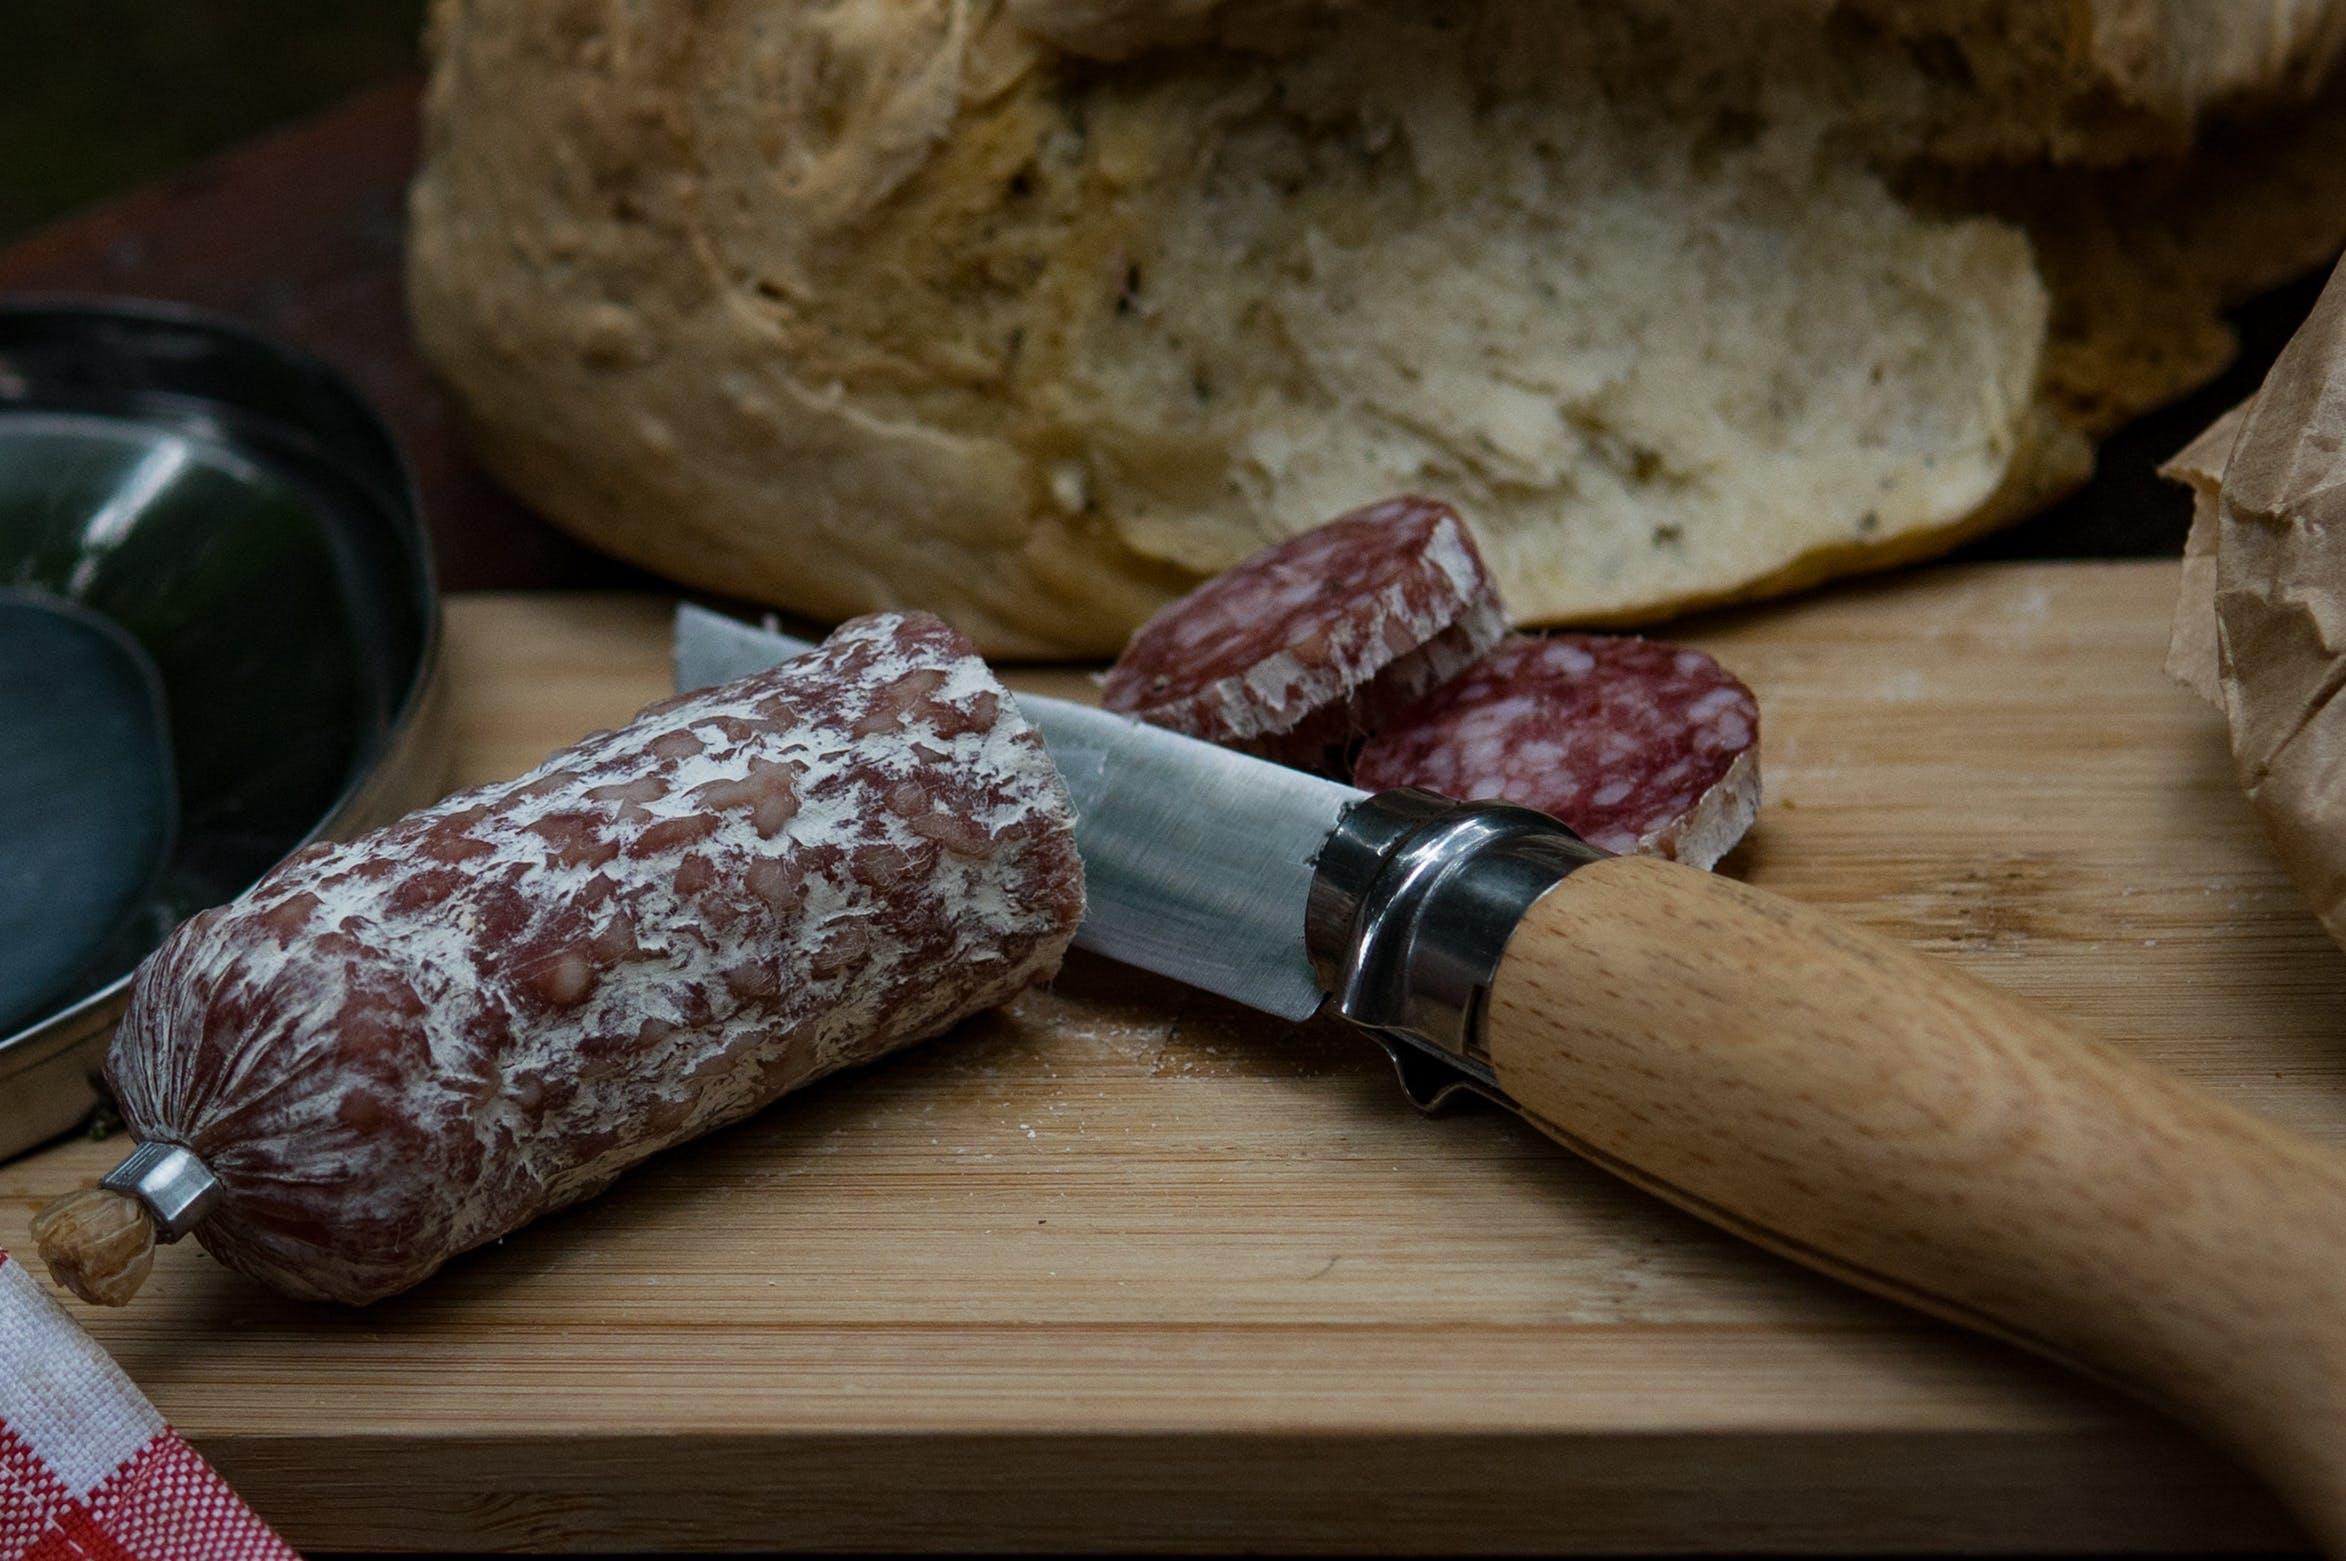 board, bread, camping knife